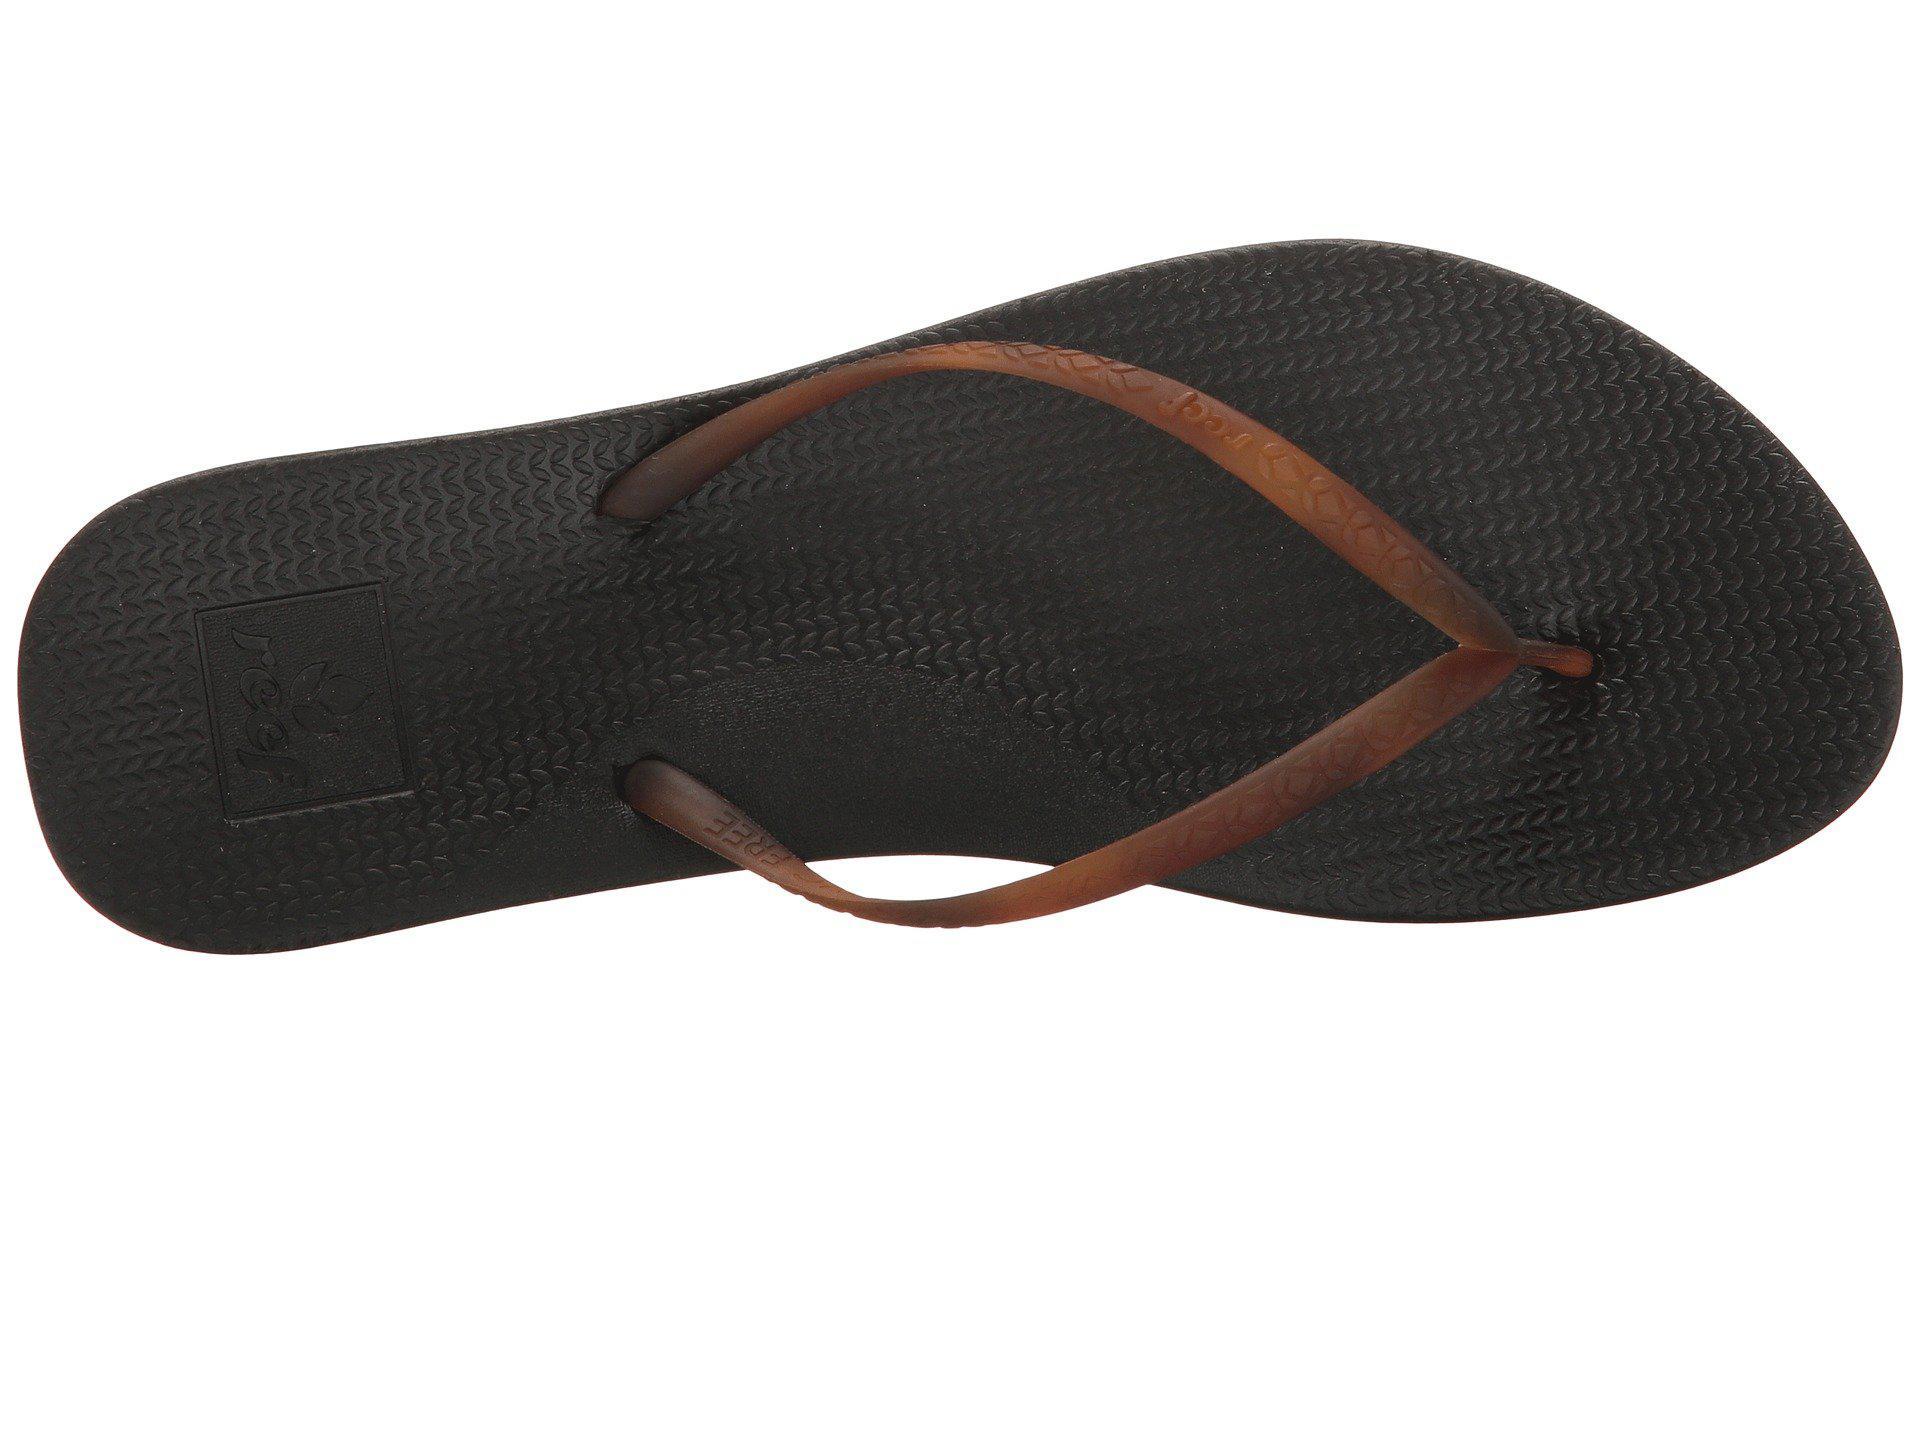 a952b3038 Reef - Escape Lux Tortoise (black Tortoise) Women s Sandals - Lyst. View  fullscreen